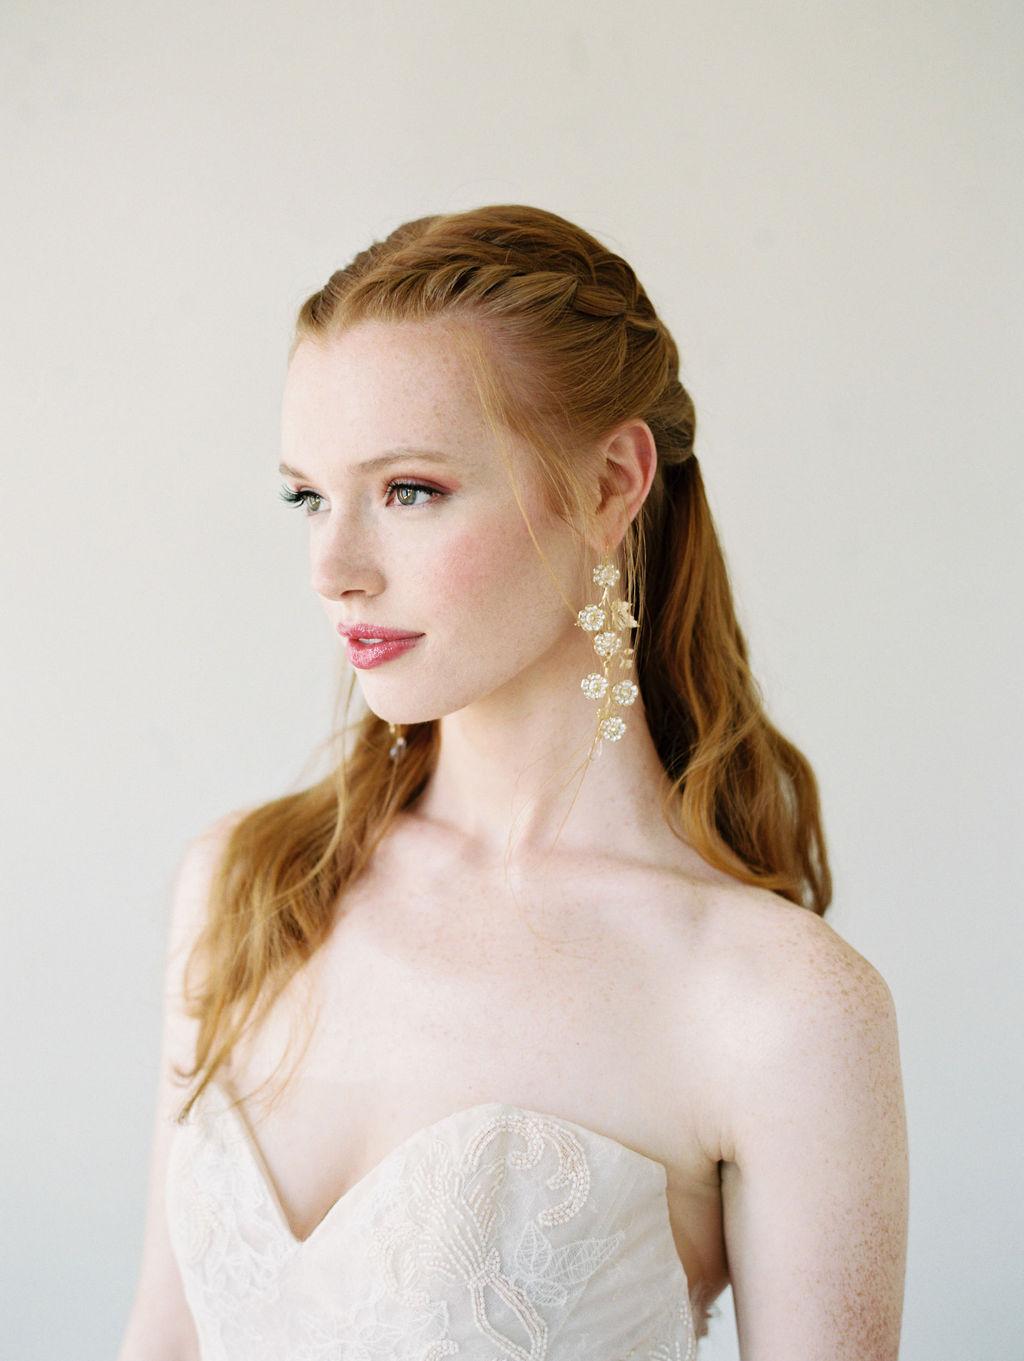 Ryan Ray Photography  —  mua   Amy Clarke  —  hair   Samantha Landis